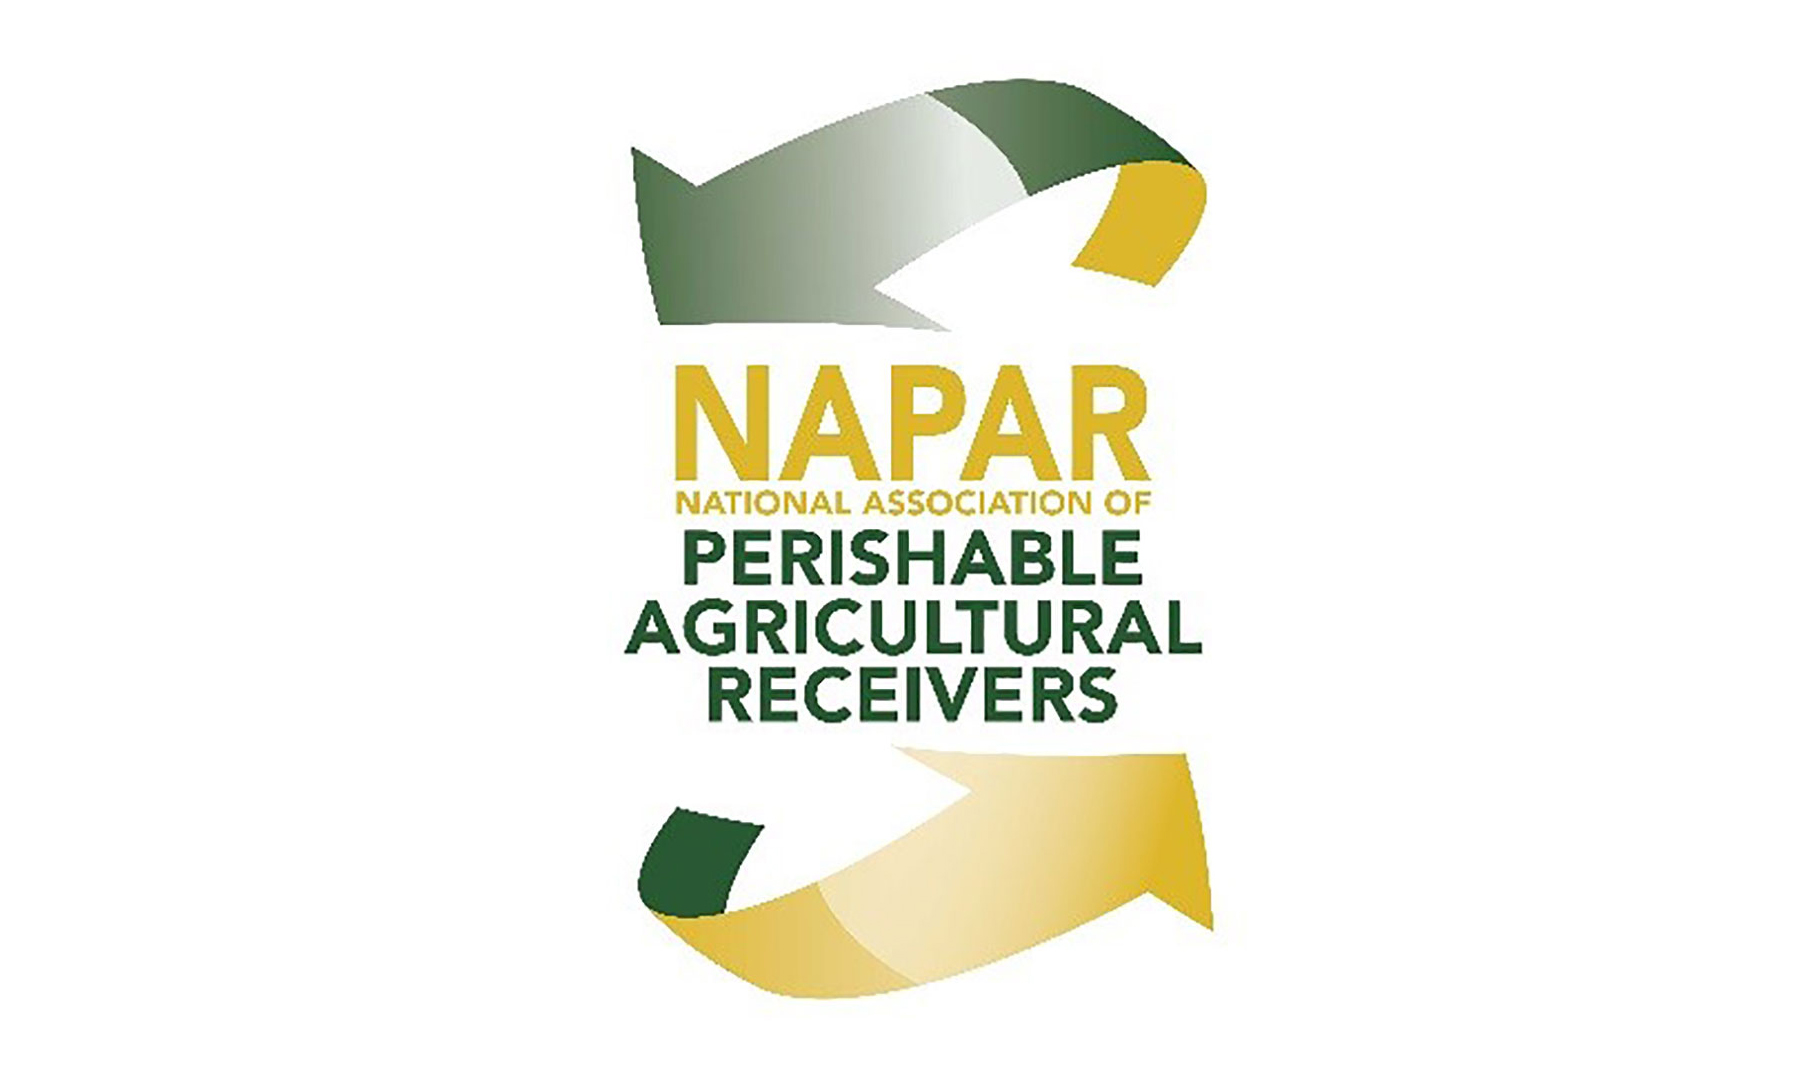 NAPAR, Topco partnership